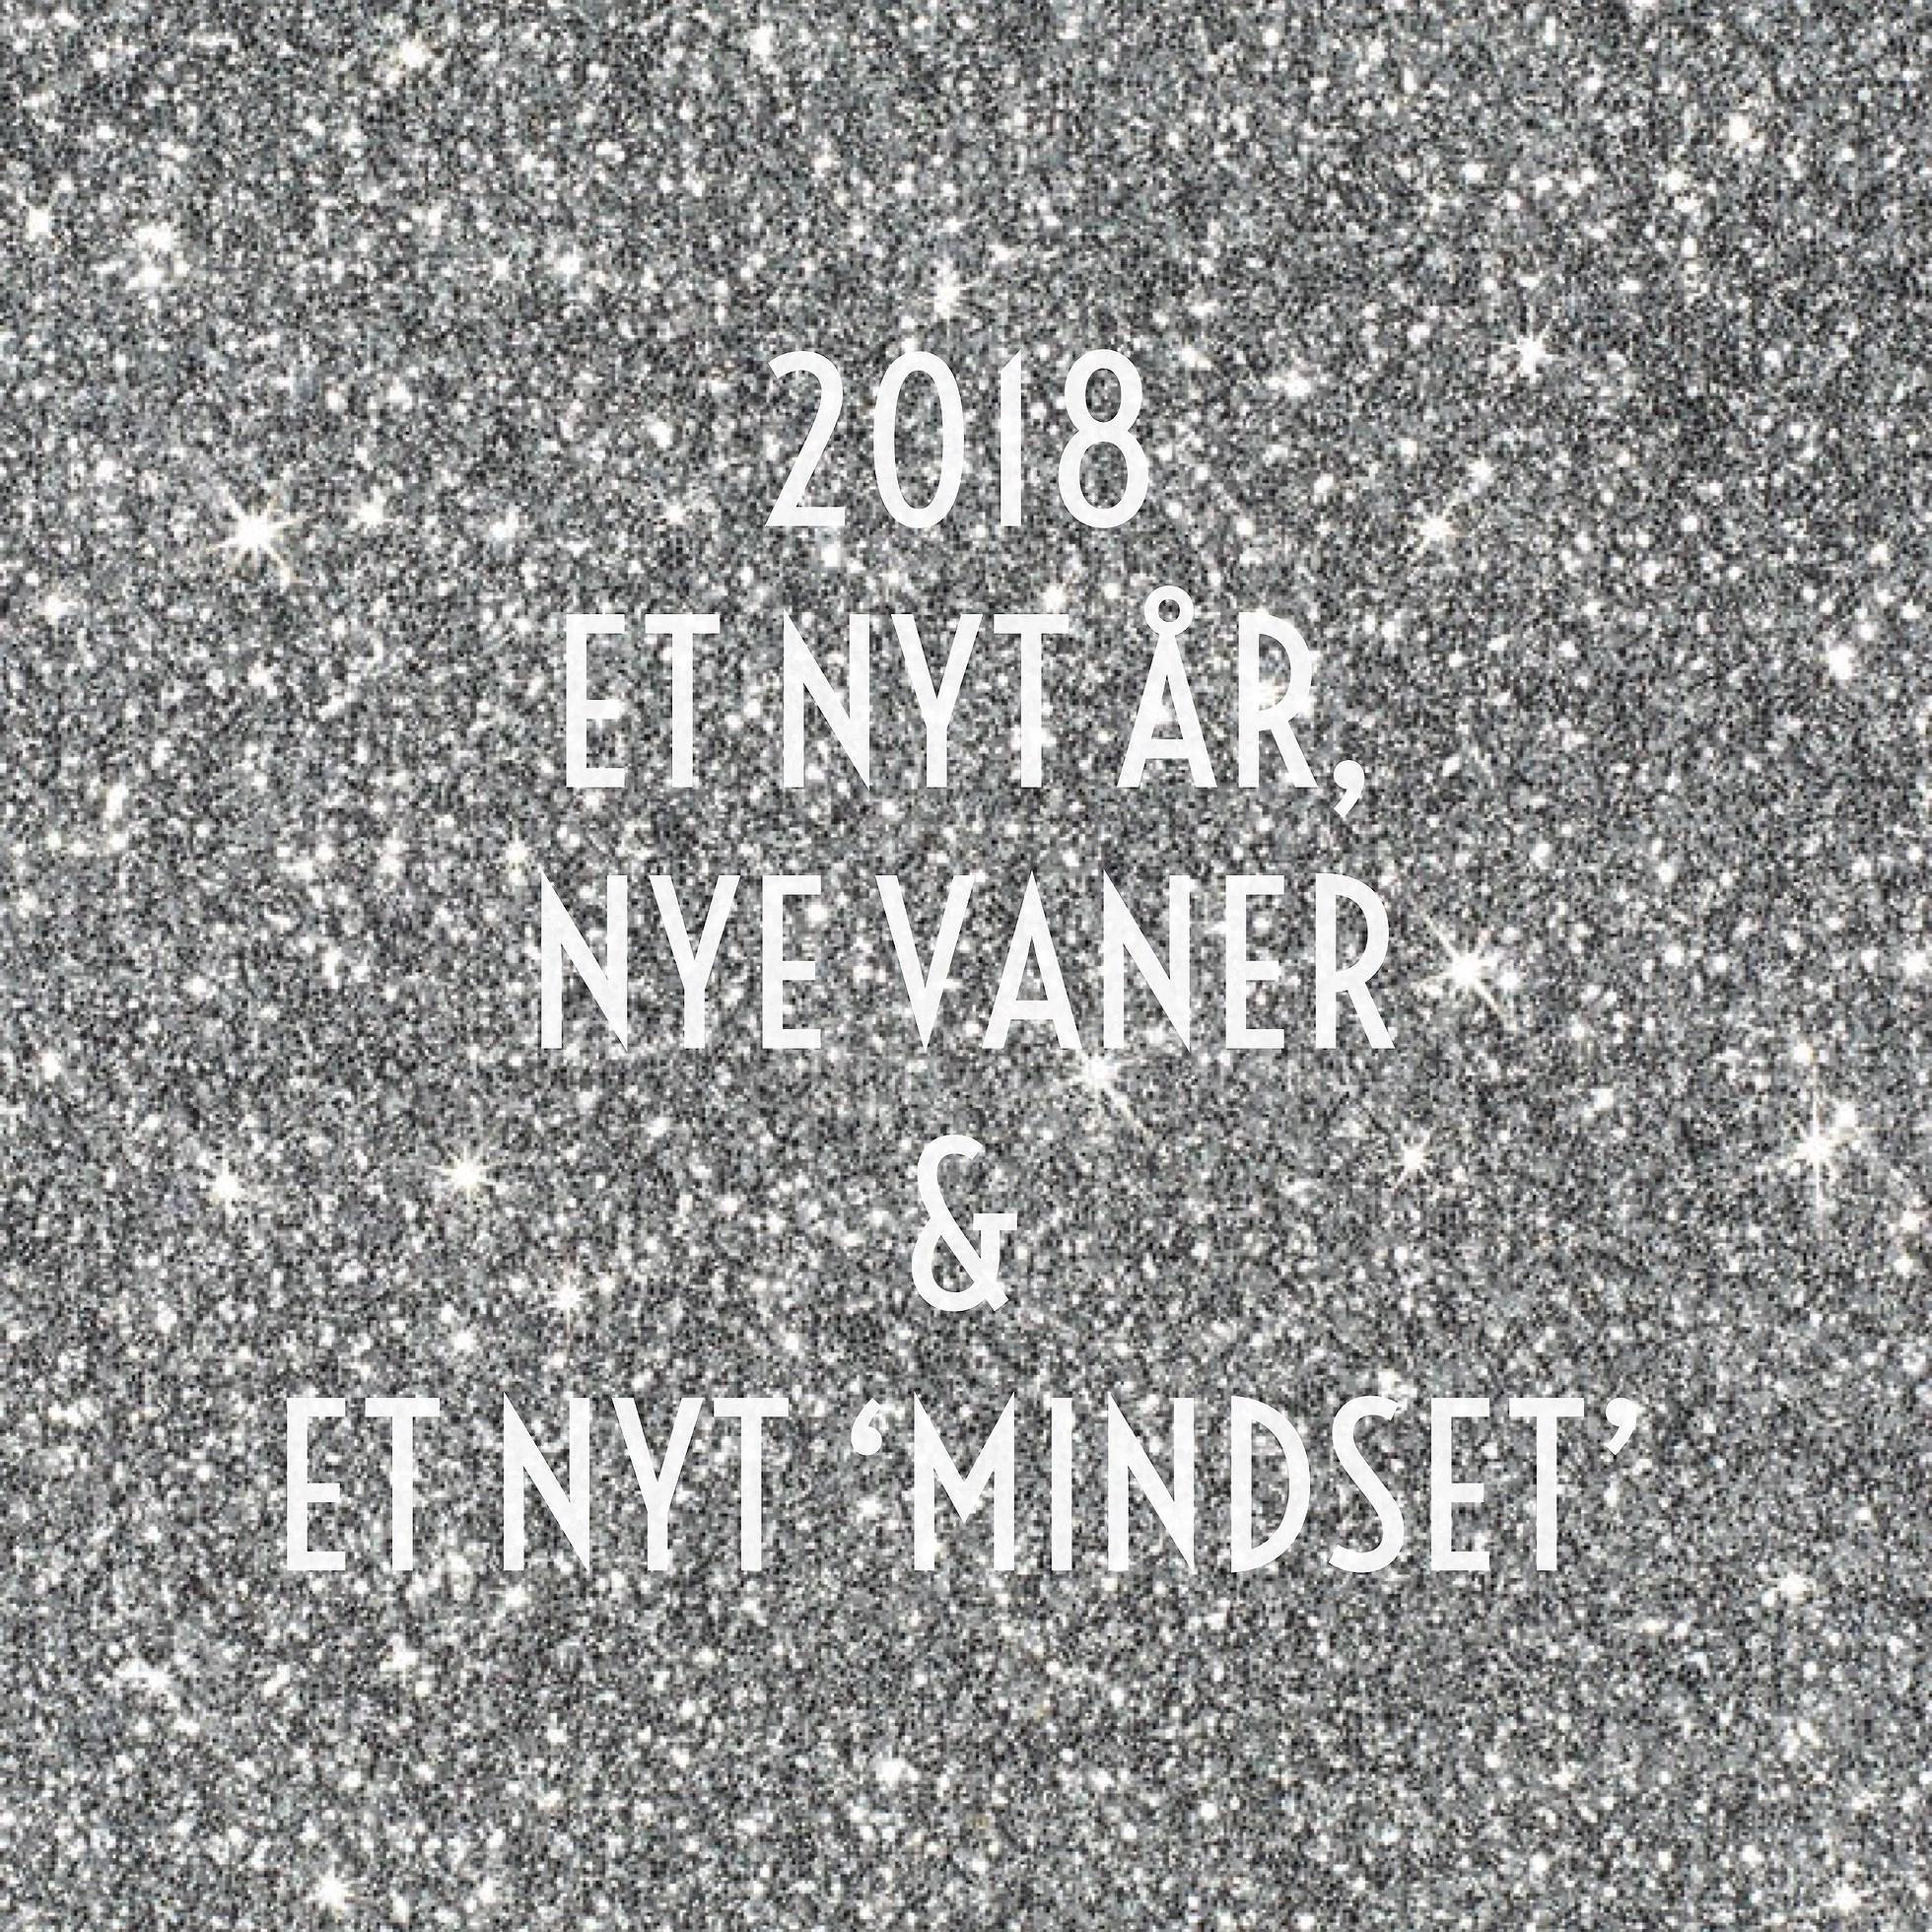 Nyt år, nye vaner & nyt mindset